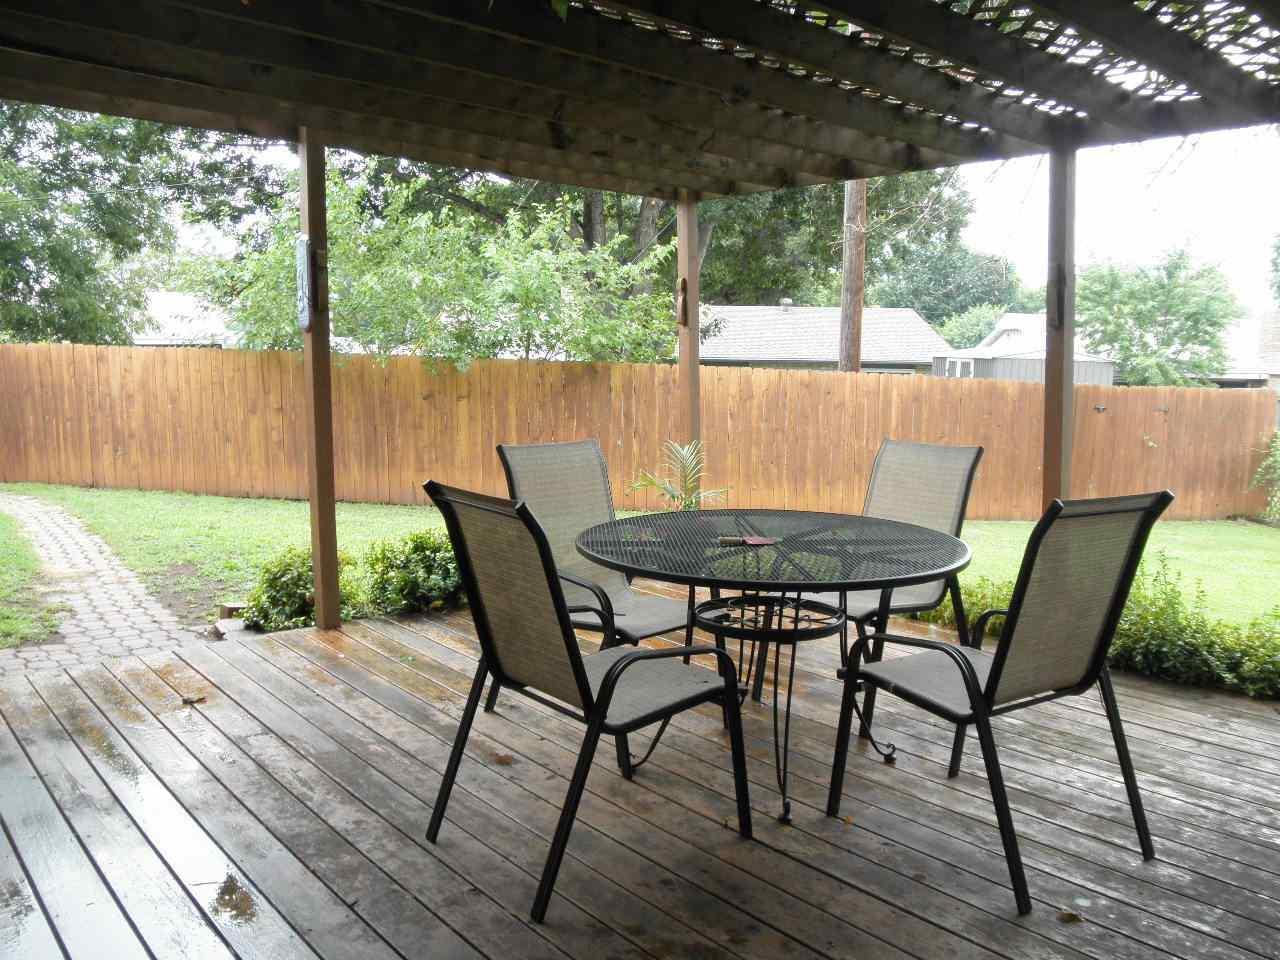 Sold Cross Sale W/ MLS | 2805 Ames  Ponca City, OK  23